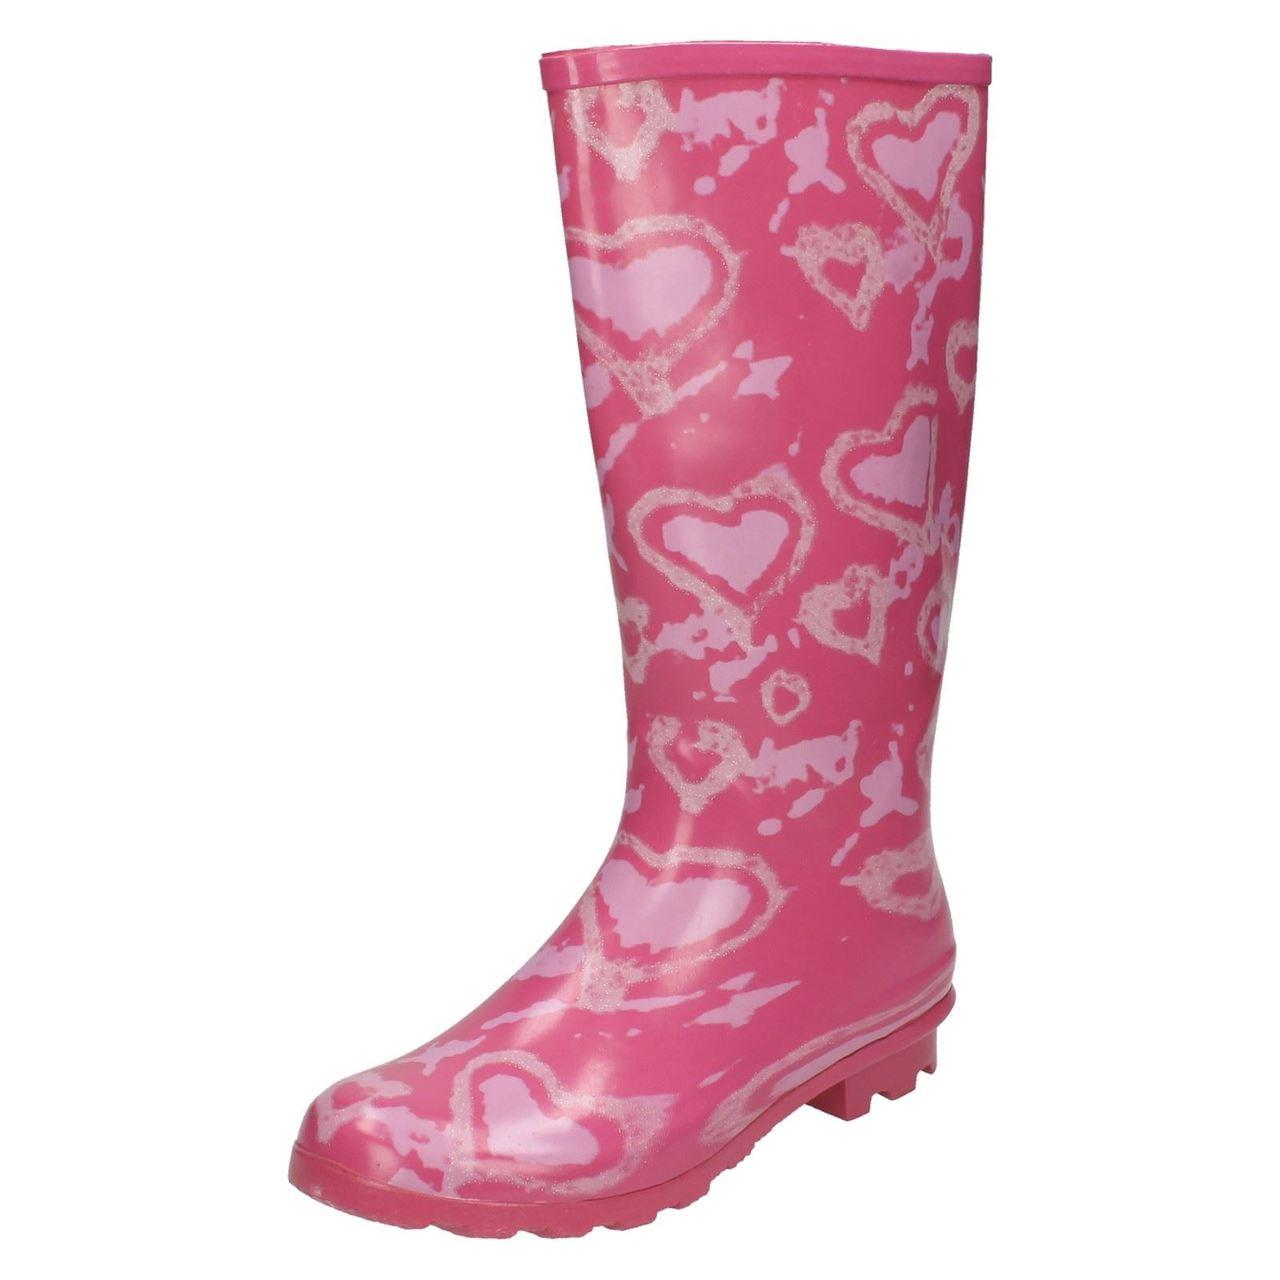 X1147 Ladies Spoton Multi Coloured Heart Design Rubber Wellington Boots!